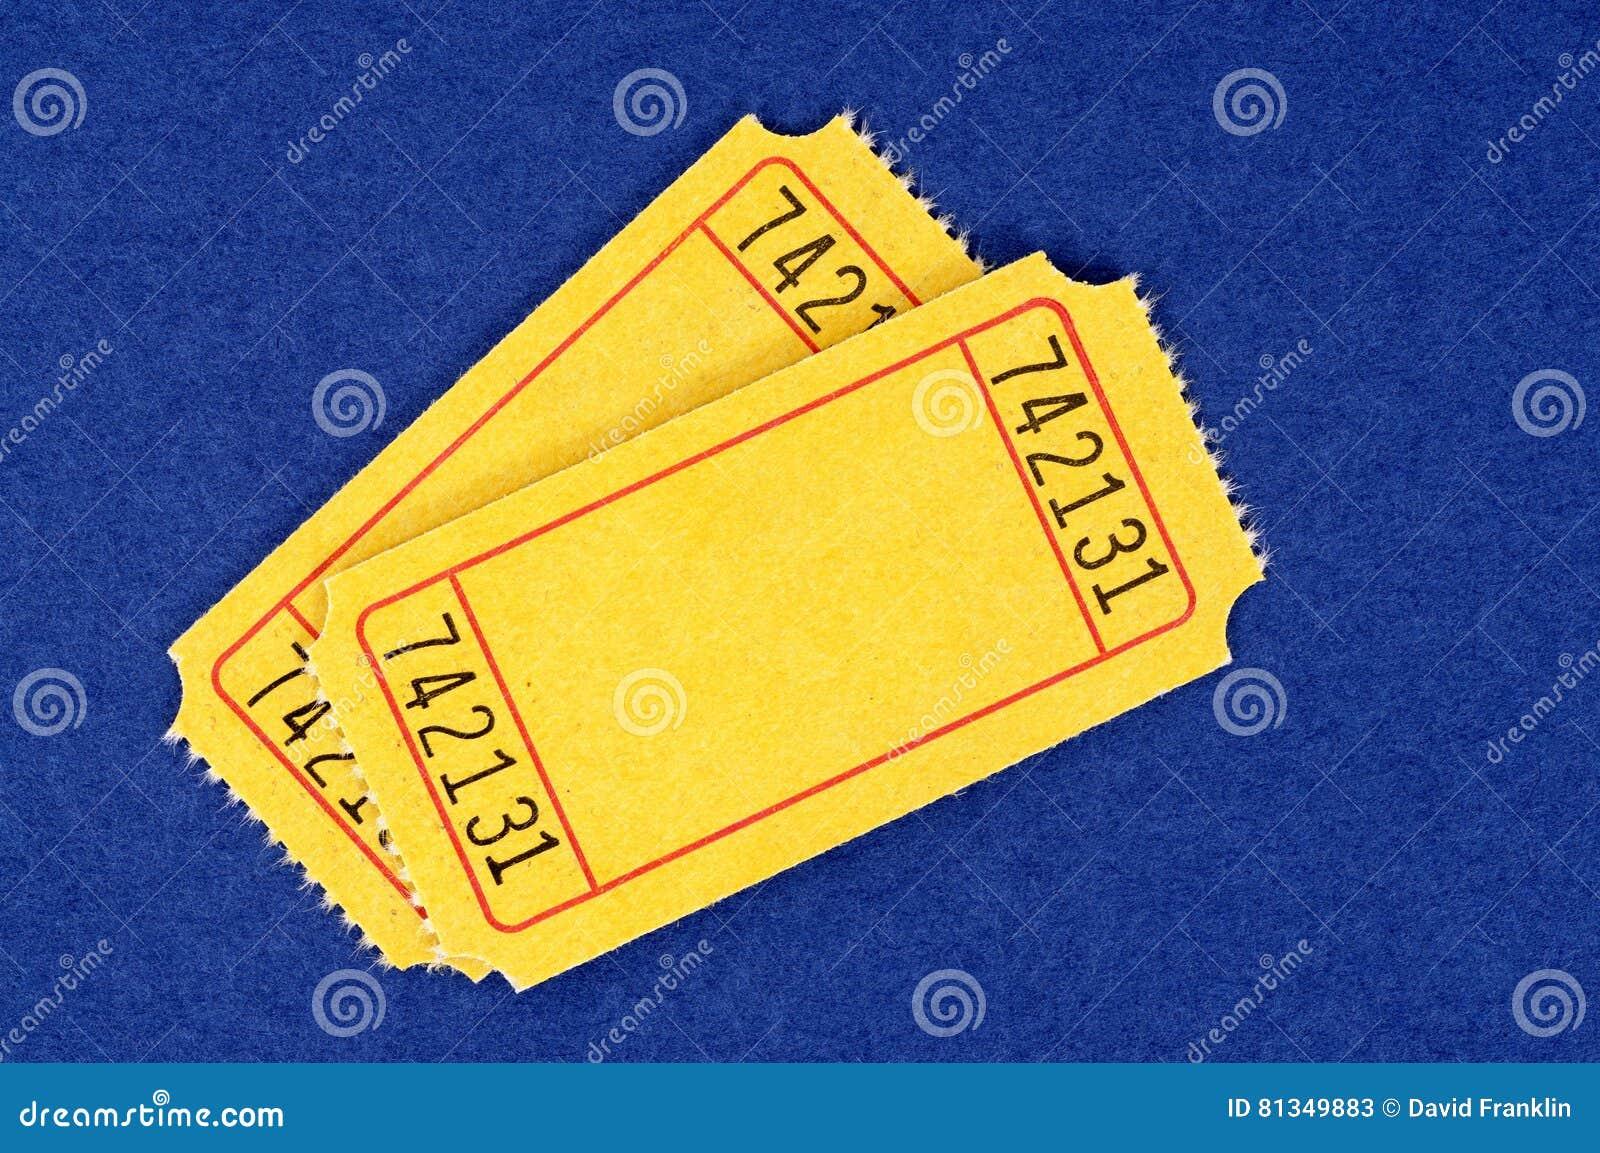 Пустые желтые билеты кино, 2, голубая предпосылка